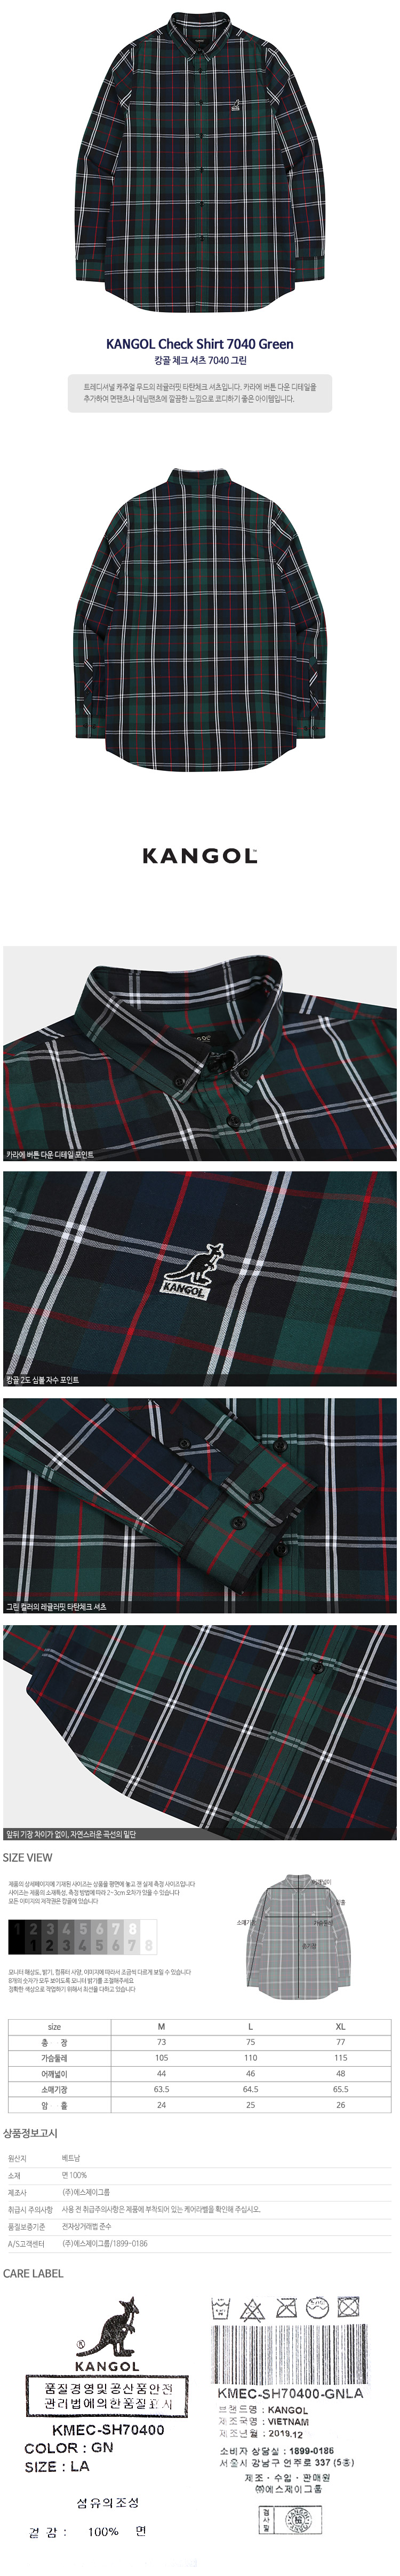 KANGOL Check Shirt 7040 GREEN